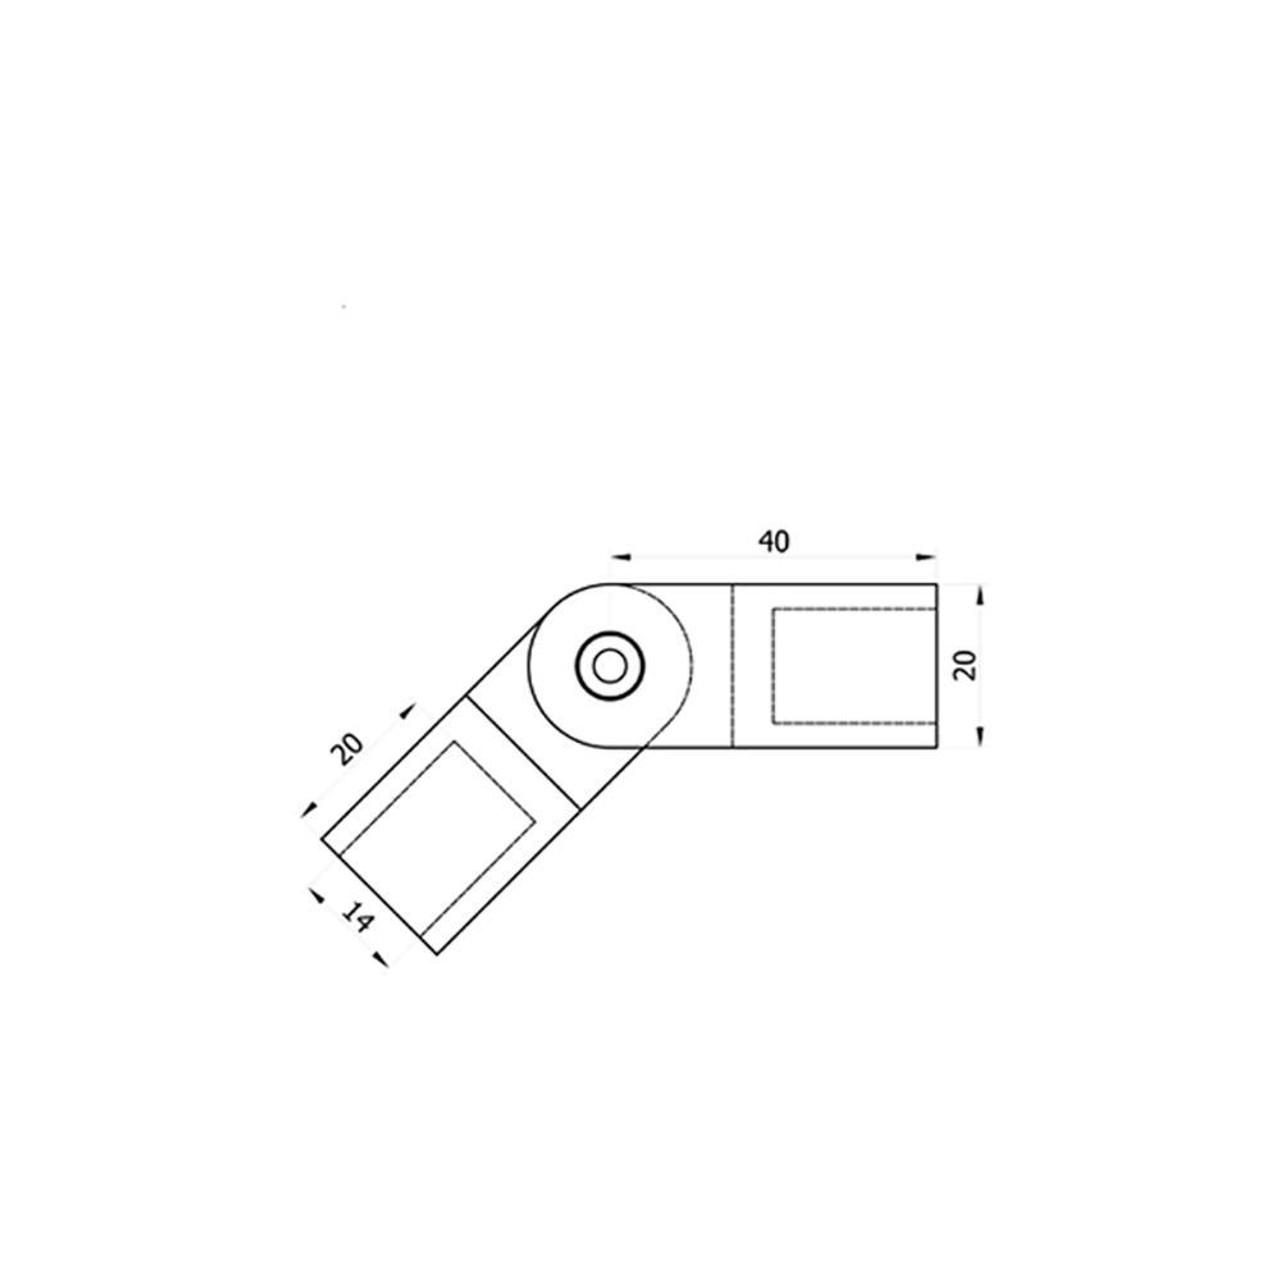 Adjustable Connector for Flat Bar Infill CADD